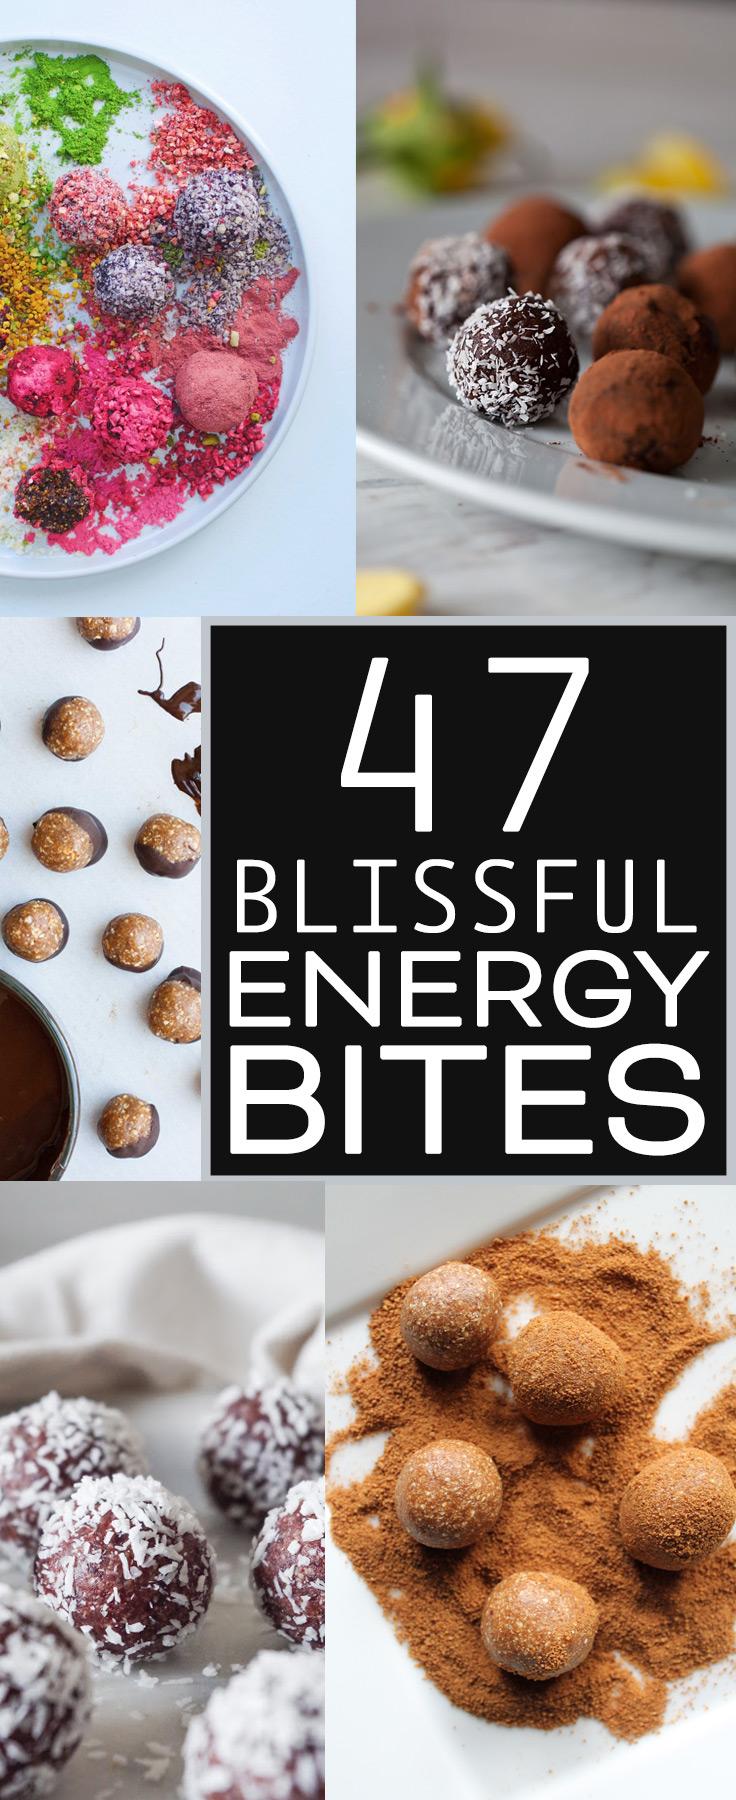 47 Blissful Vegan & Gluten-Free Energy Bite Recipes collected by Kari of Beautiful Ingredient